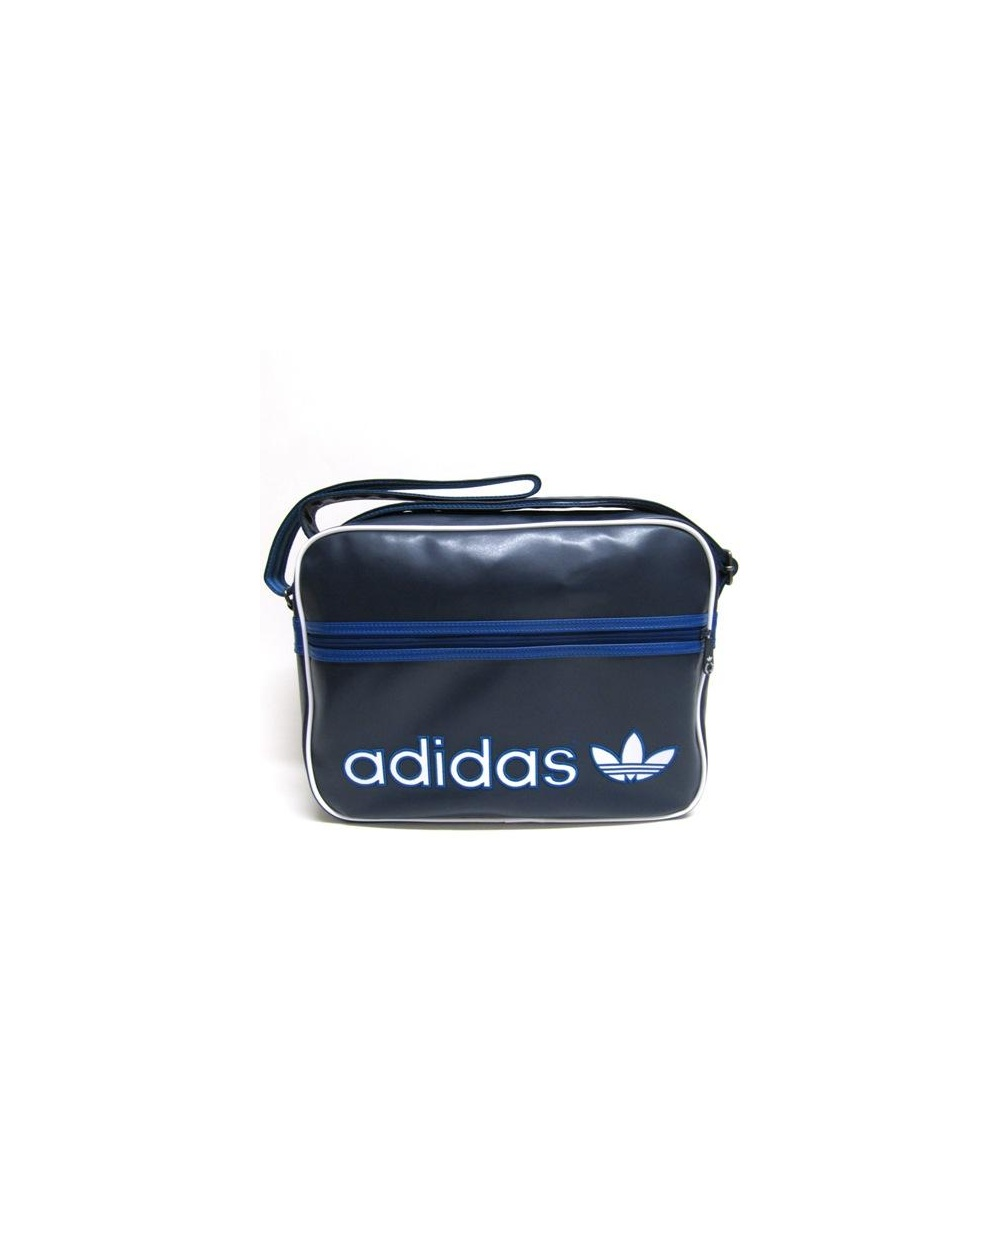 Adidas Originals Airline Shoulder Bag Dark Navy - Adidas Originals Bag 35634b558d